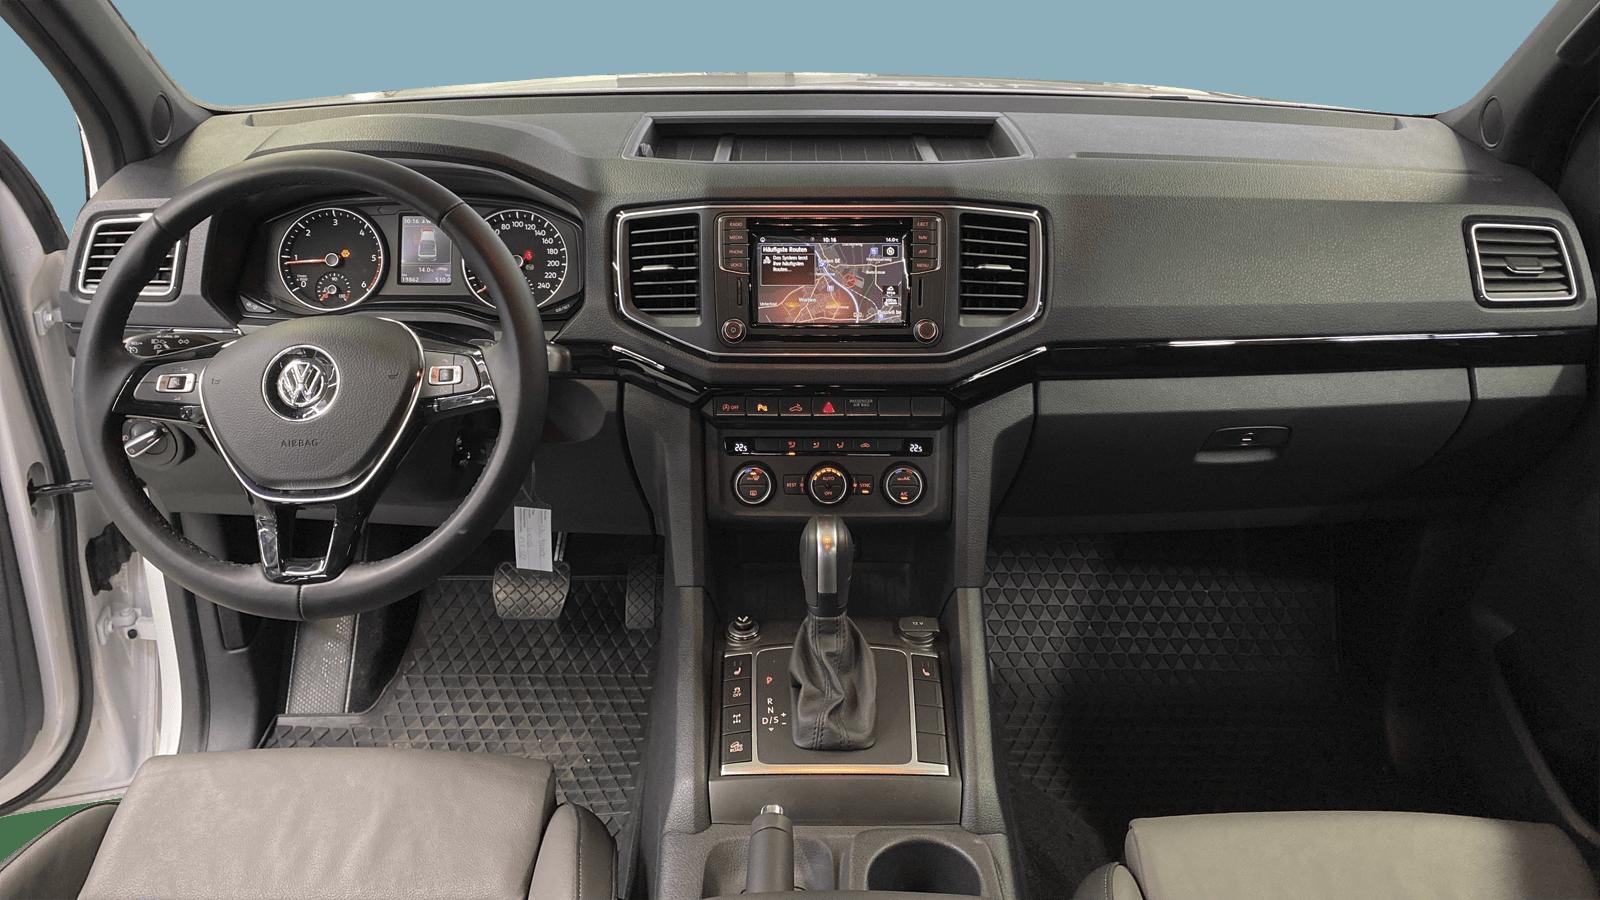 VW Amarok White interior - Clyde car subscription